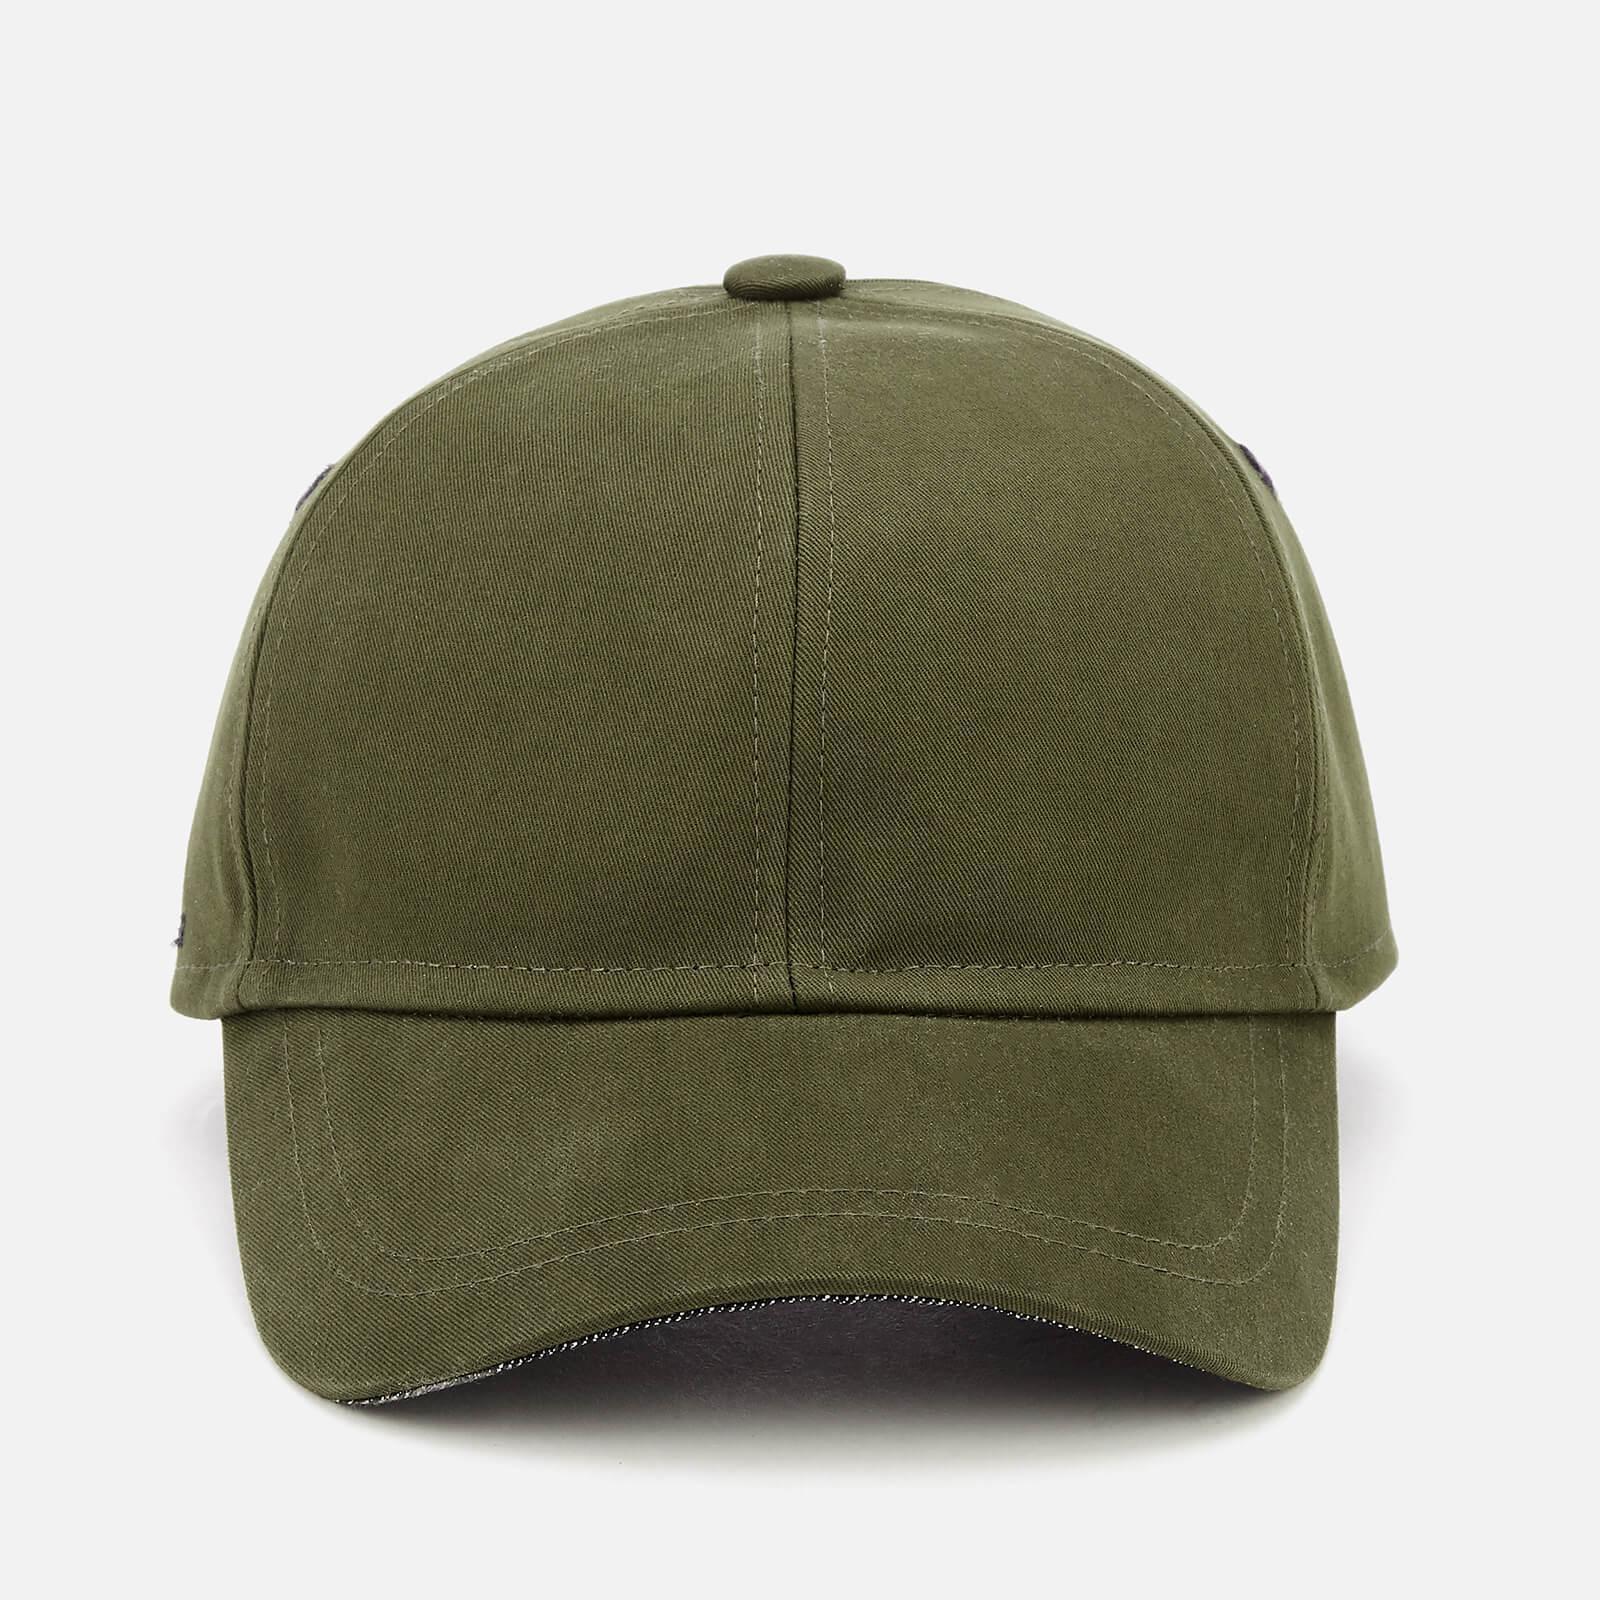 Lyst - Ted Baker Battin Baseball Cap in Green for Men - Save 49% 3da7d4eda364